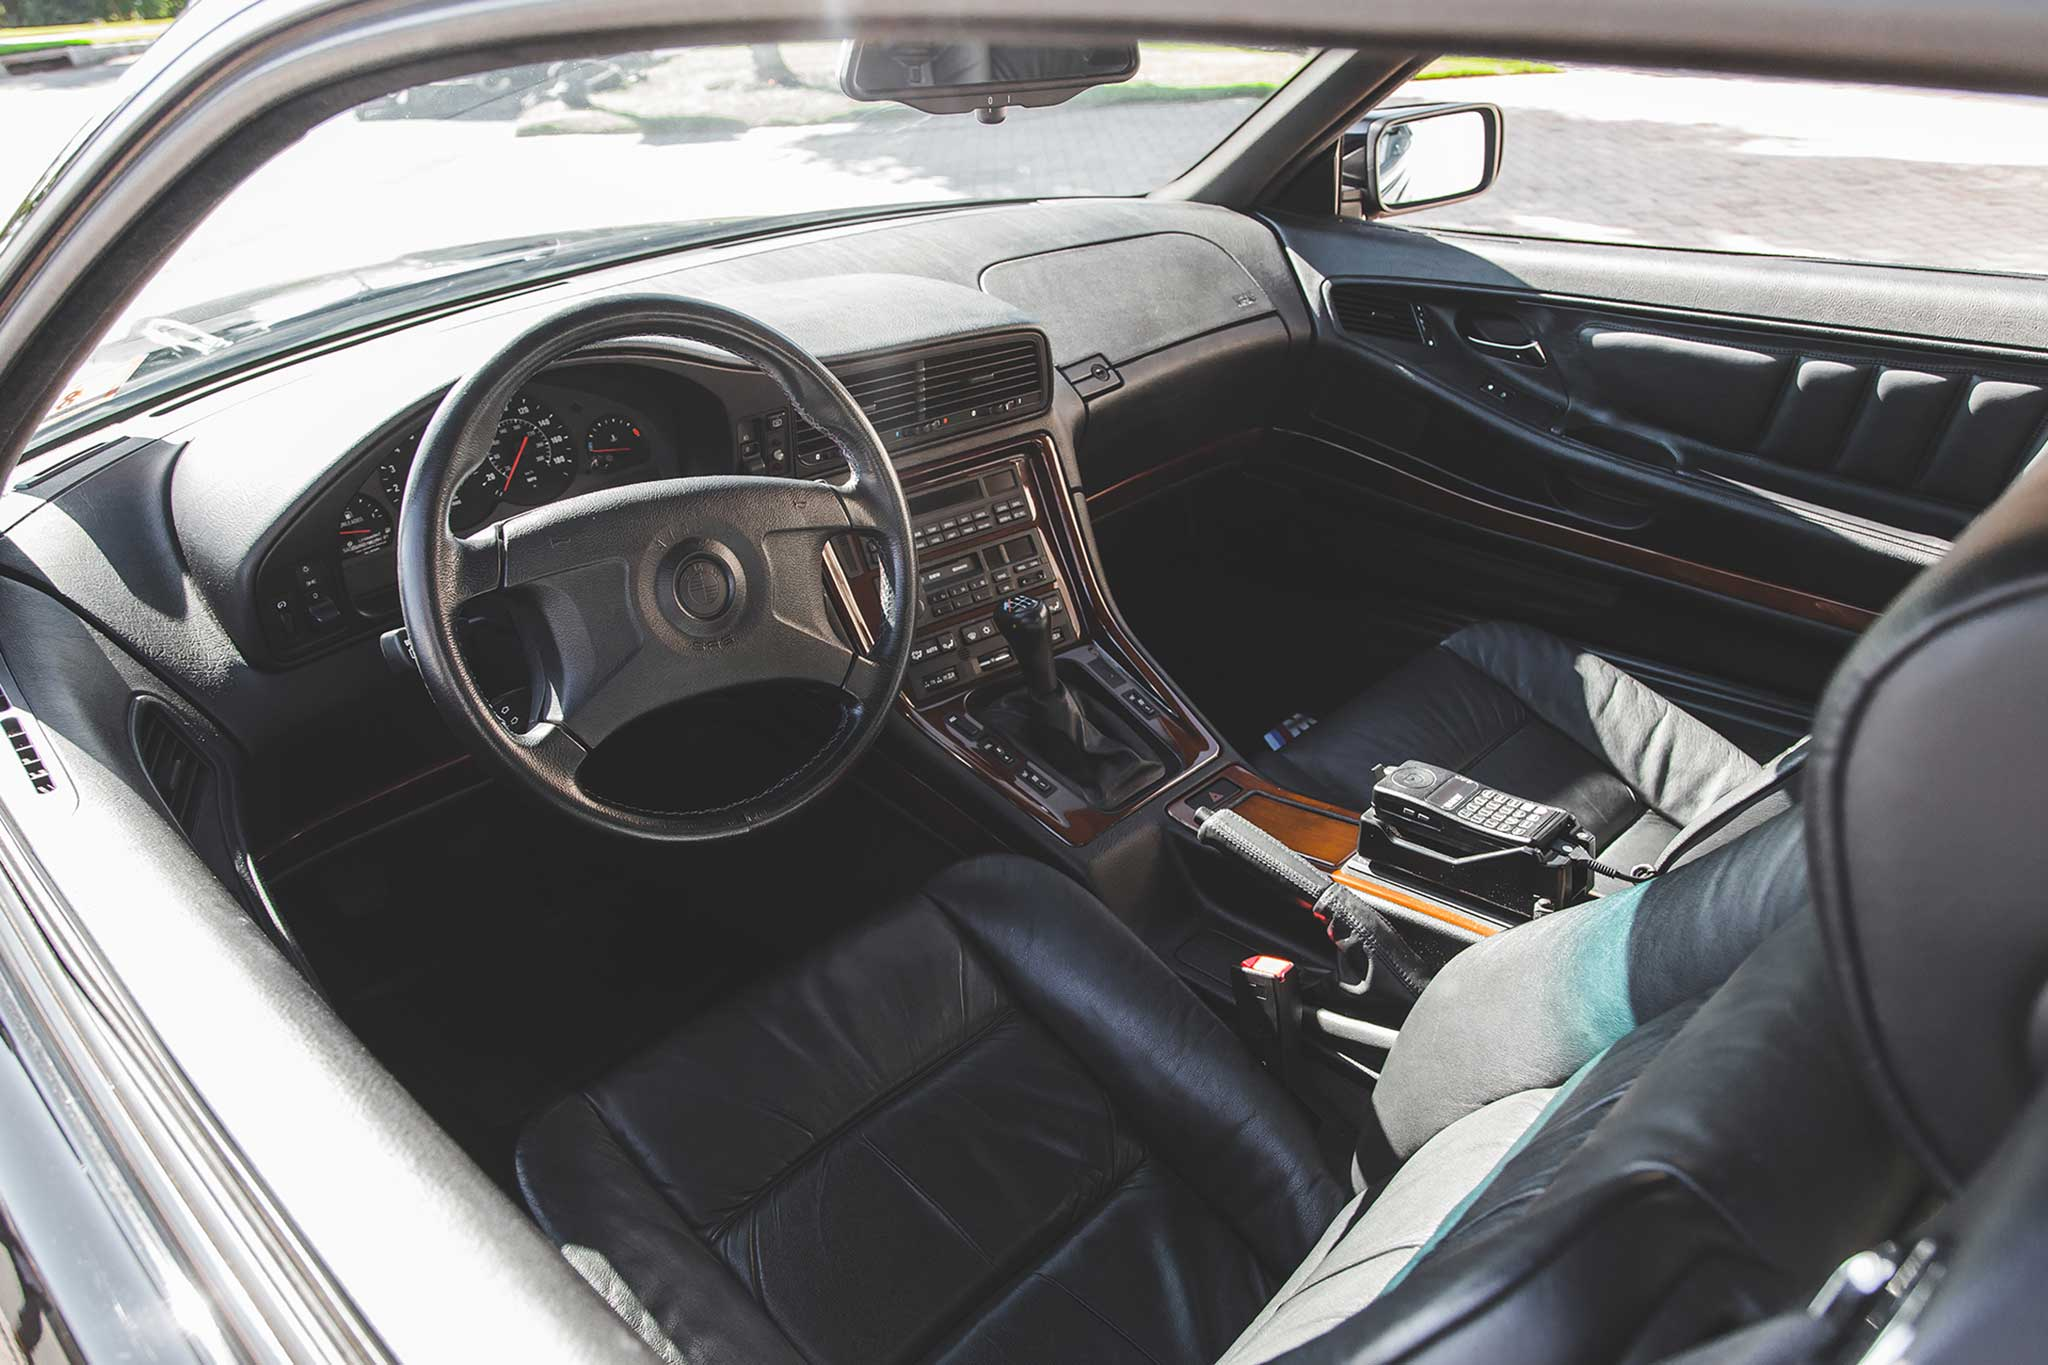 1994-BMW-850CSi-cabin-01.jpg